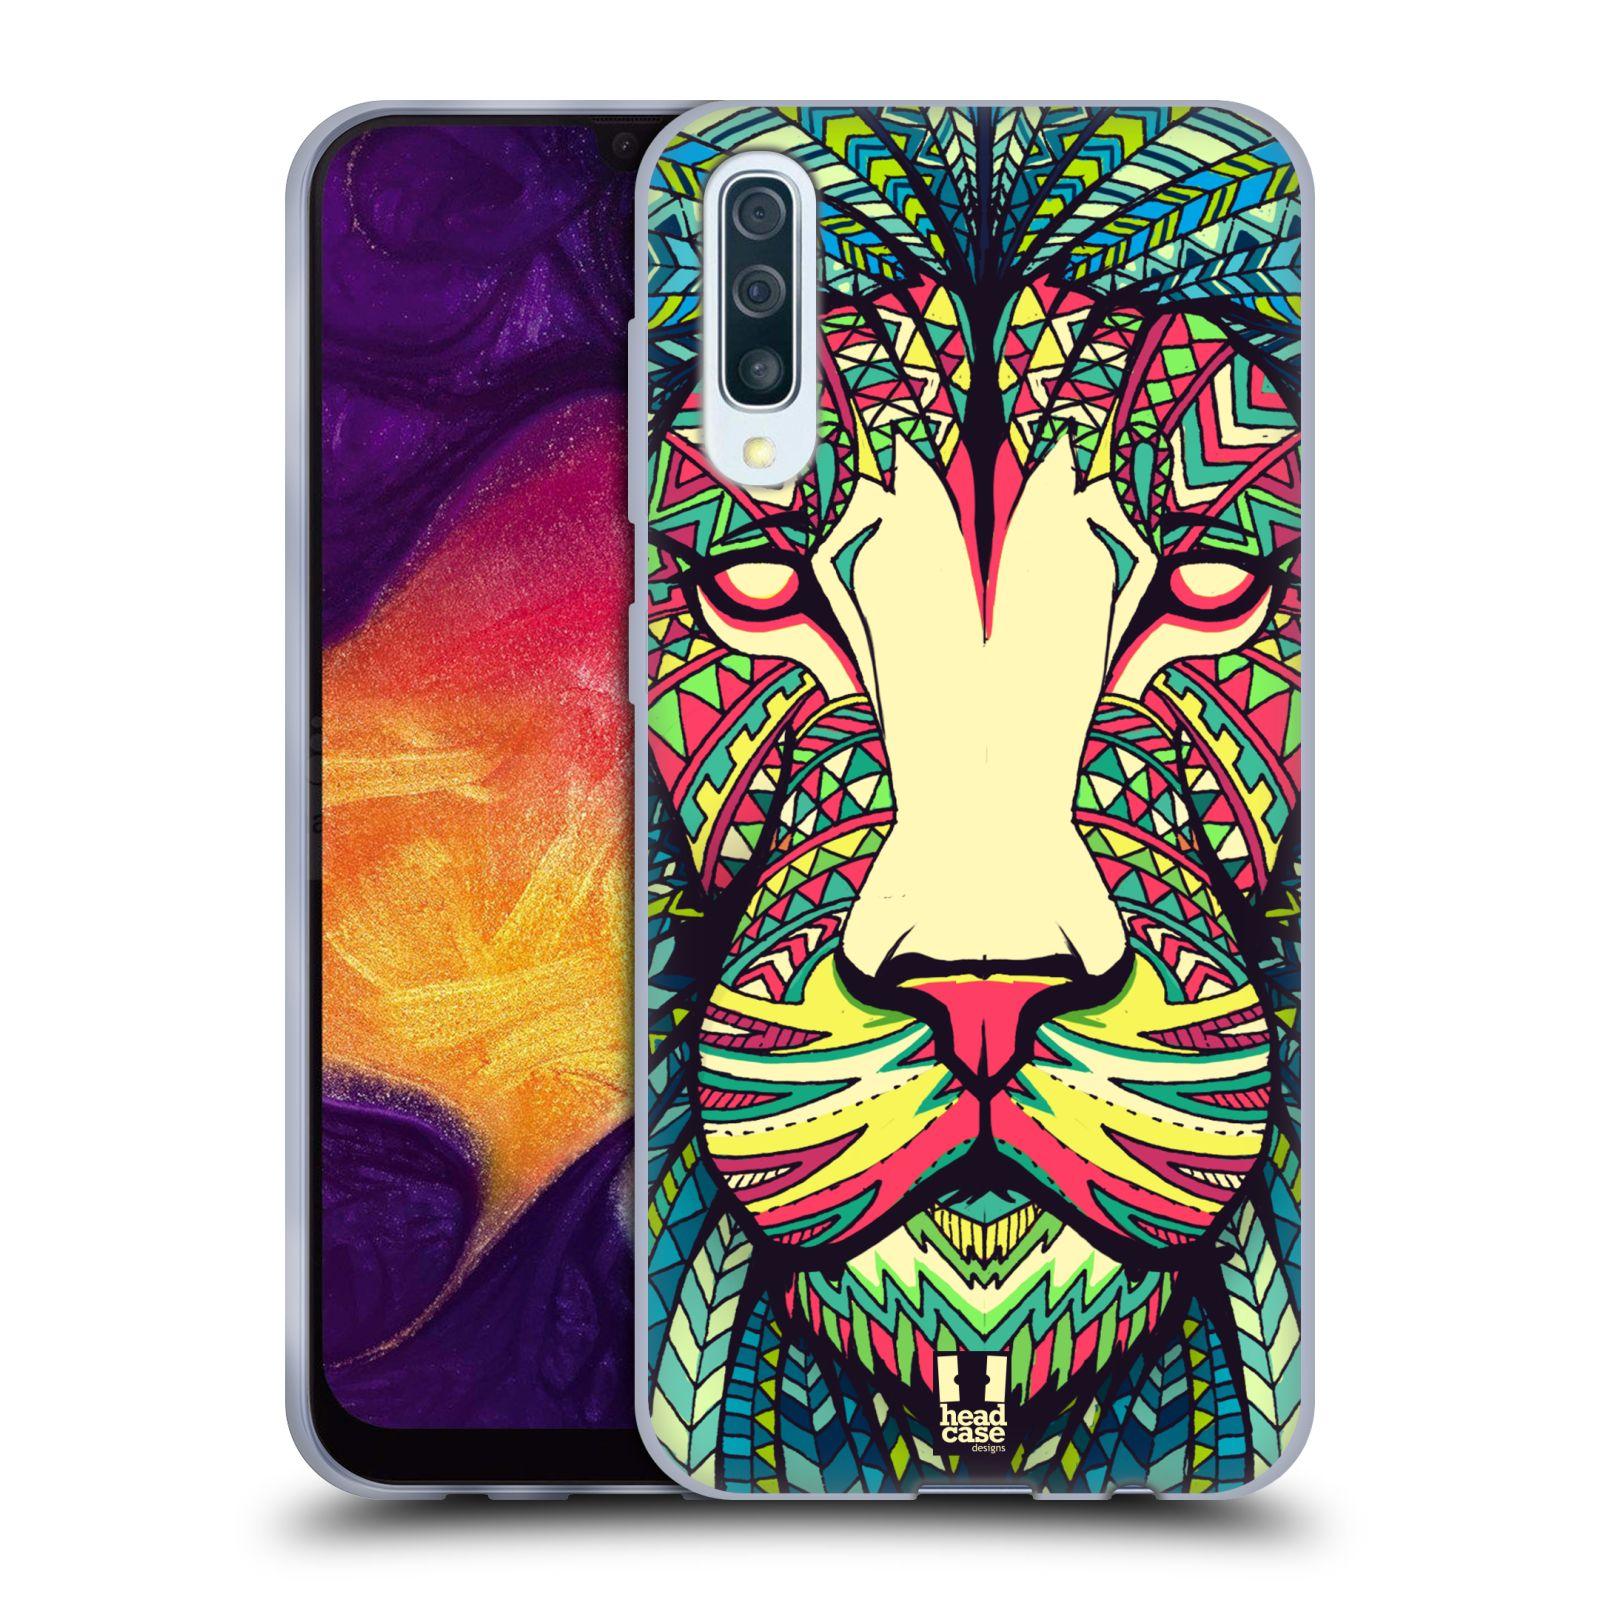 Silikonové pouzdro na mobil Samsung Galaxy A50 / A30s - Head Case - AZTEC LEV